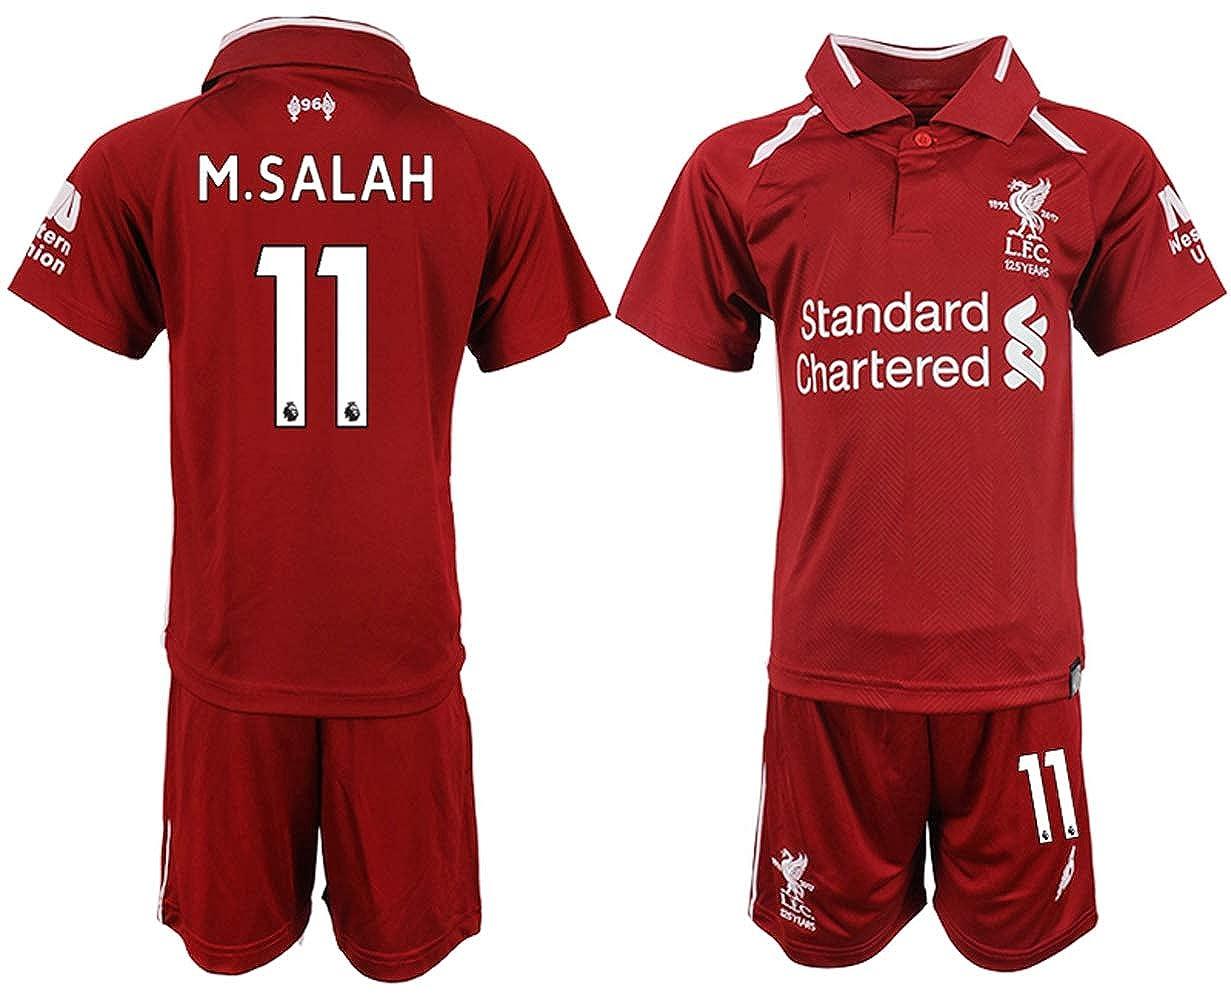 2018/19 New Liverpool M.Salah Kid's Soccer Jersey